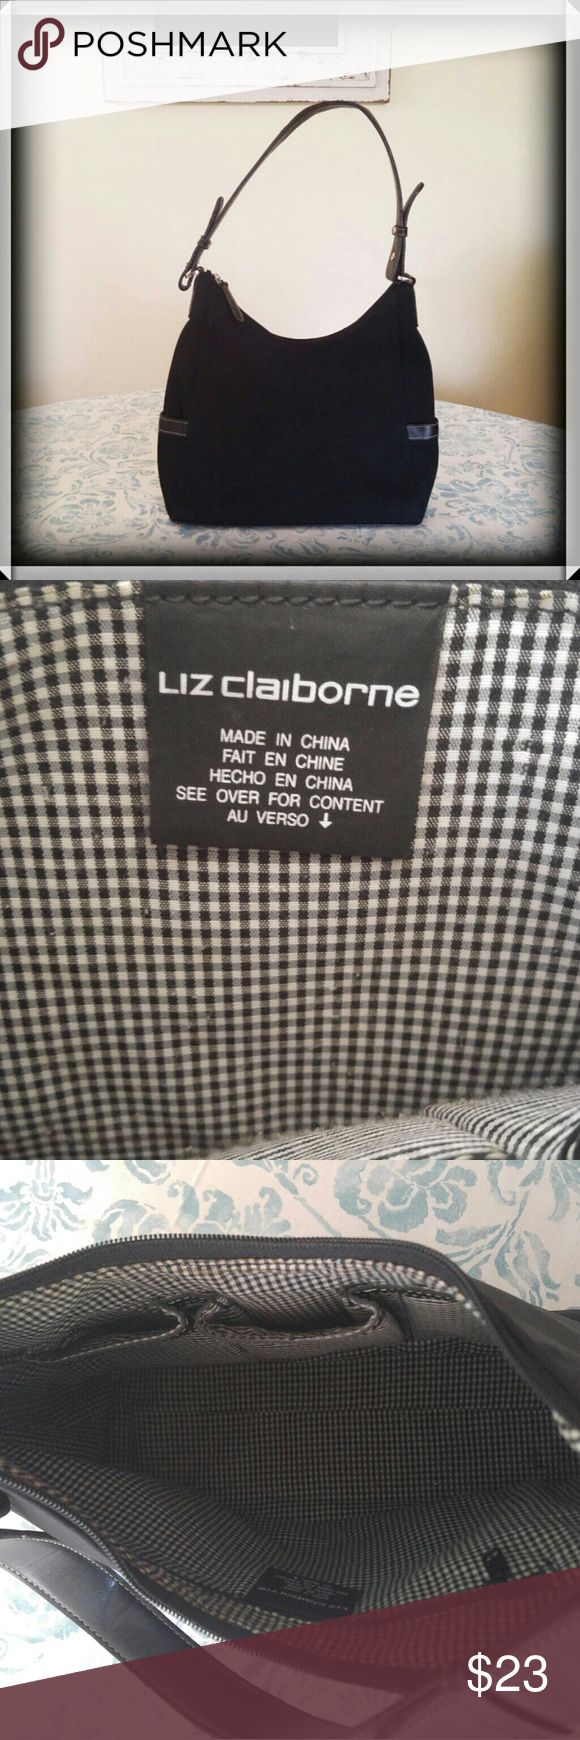 NWOT Liz Claiborne Purse Never used black Liz Claiborne purse Liz Claiborne Bags Shoulder Bags